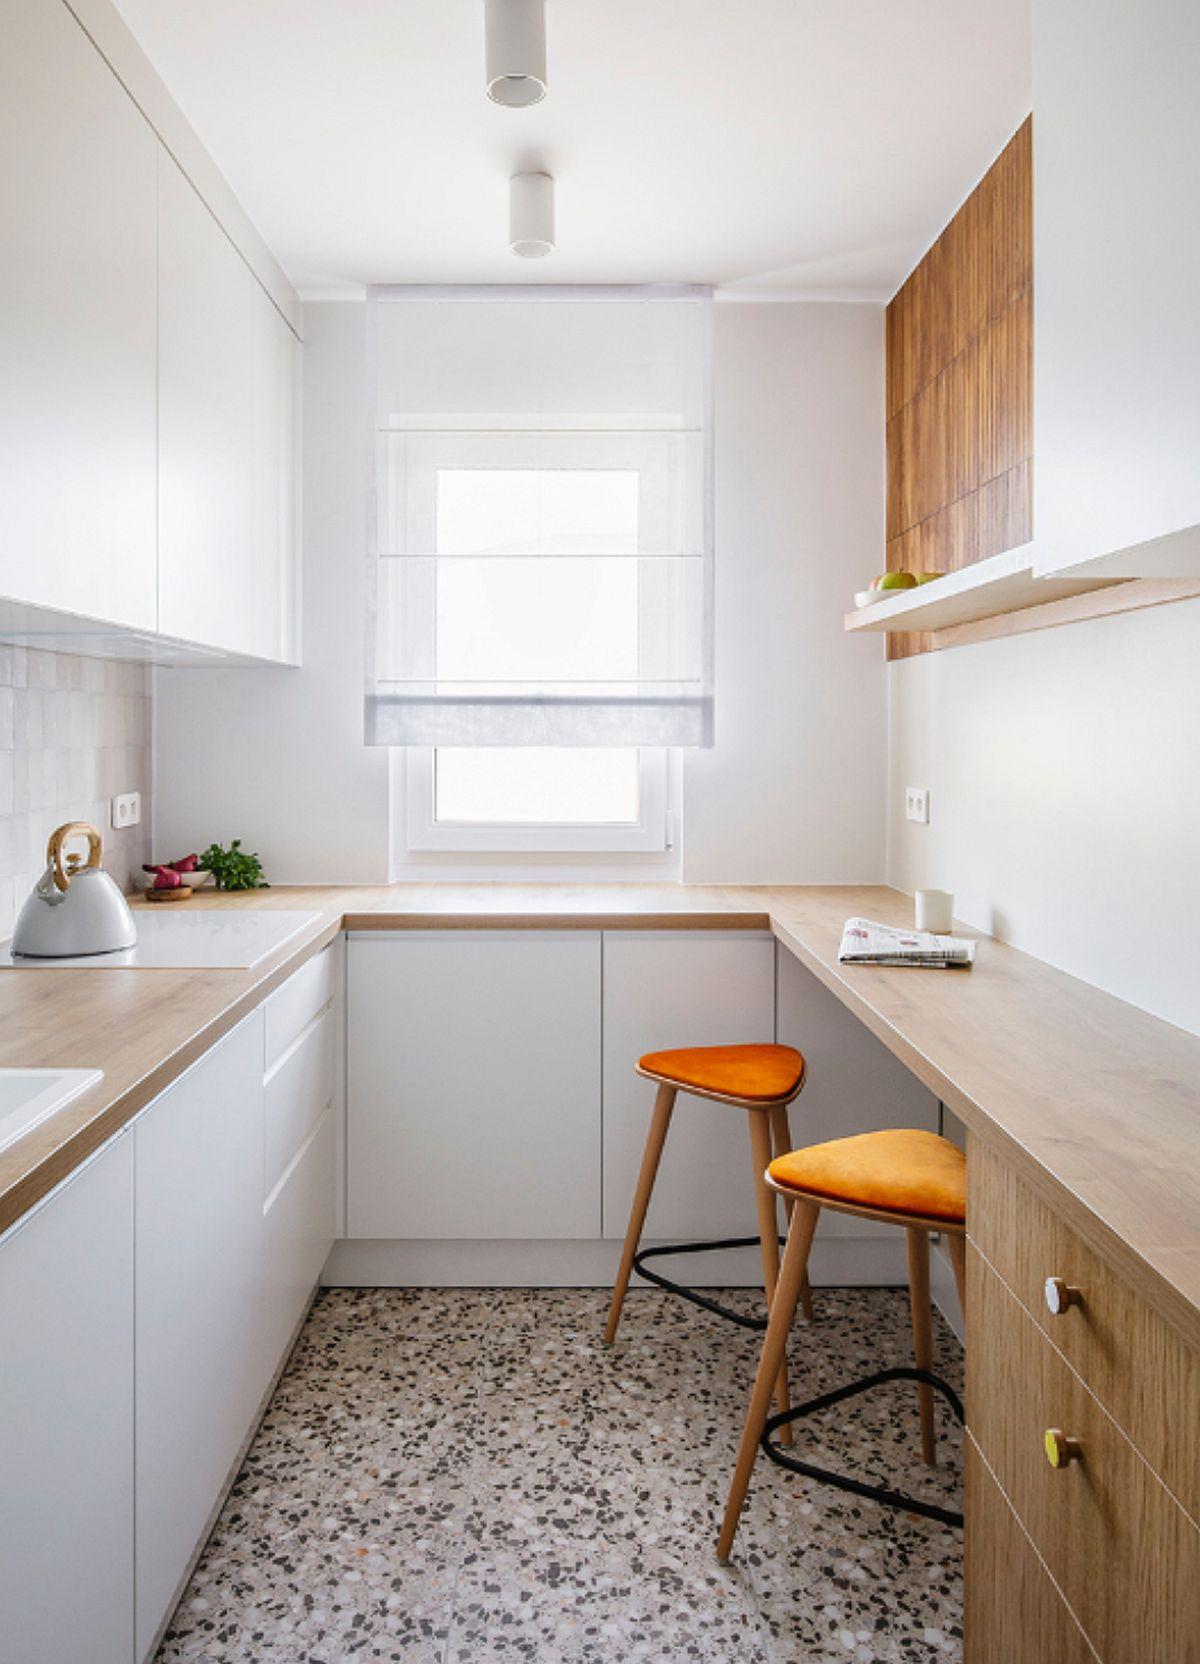 adelaparvu.com despre amenajare apartament 4 camere, 70 mp, design Kowalczyk-Gajda, Foto Kroniki Studio (13)